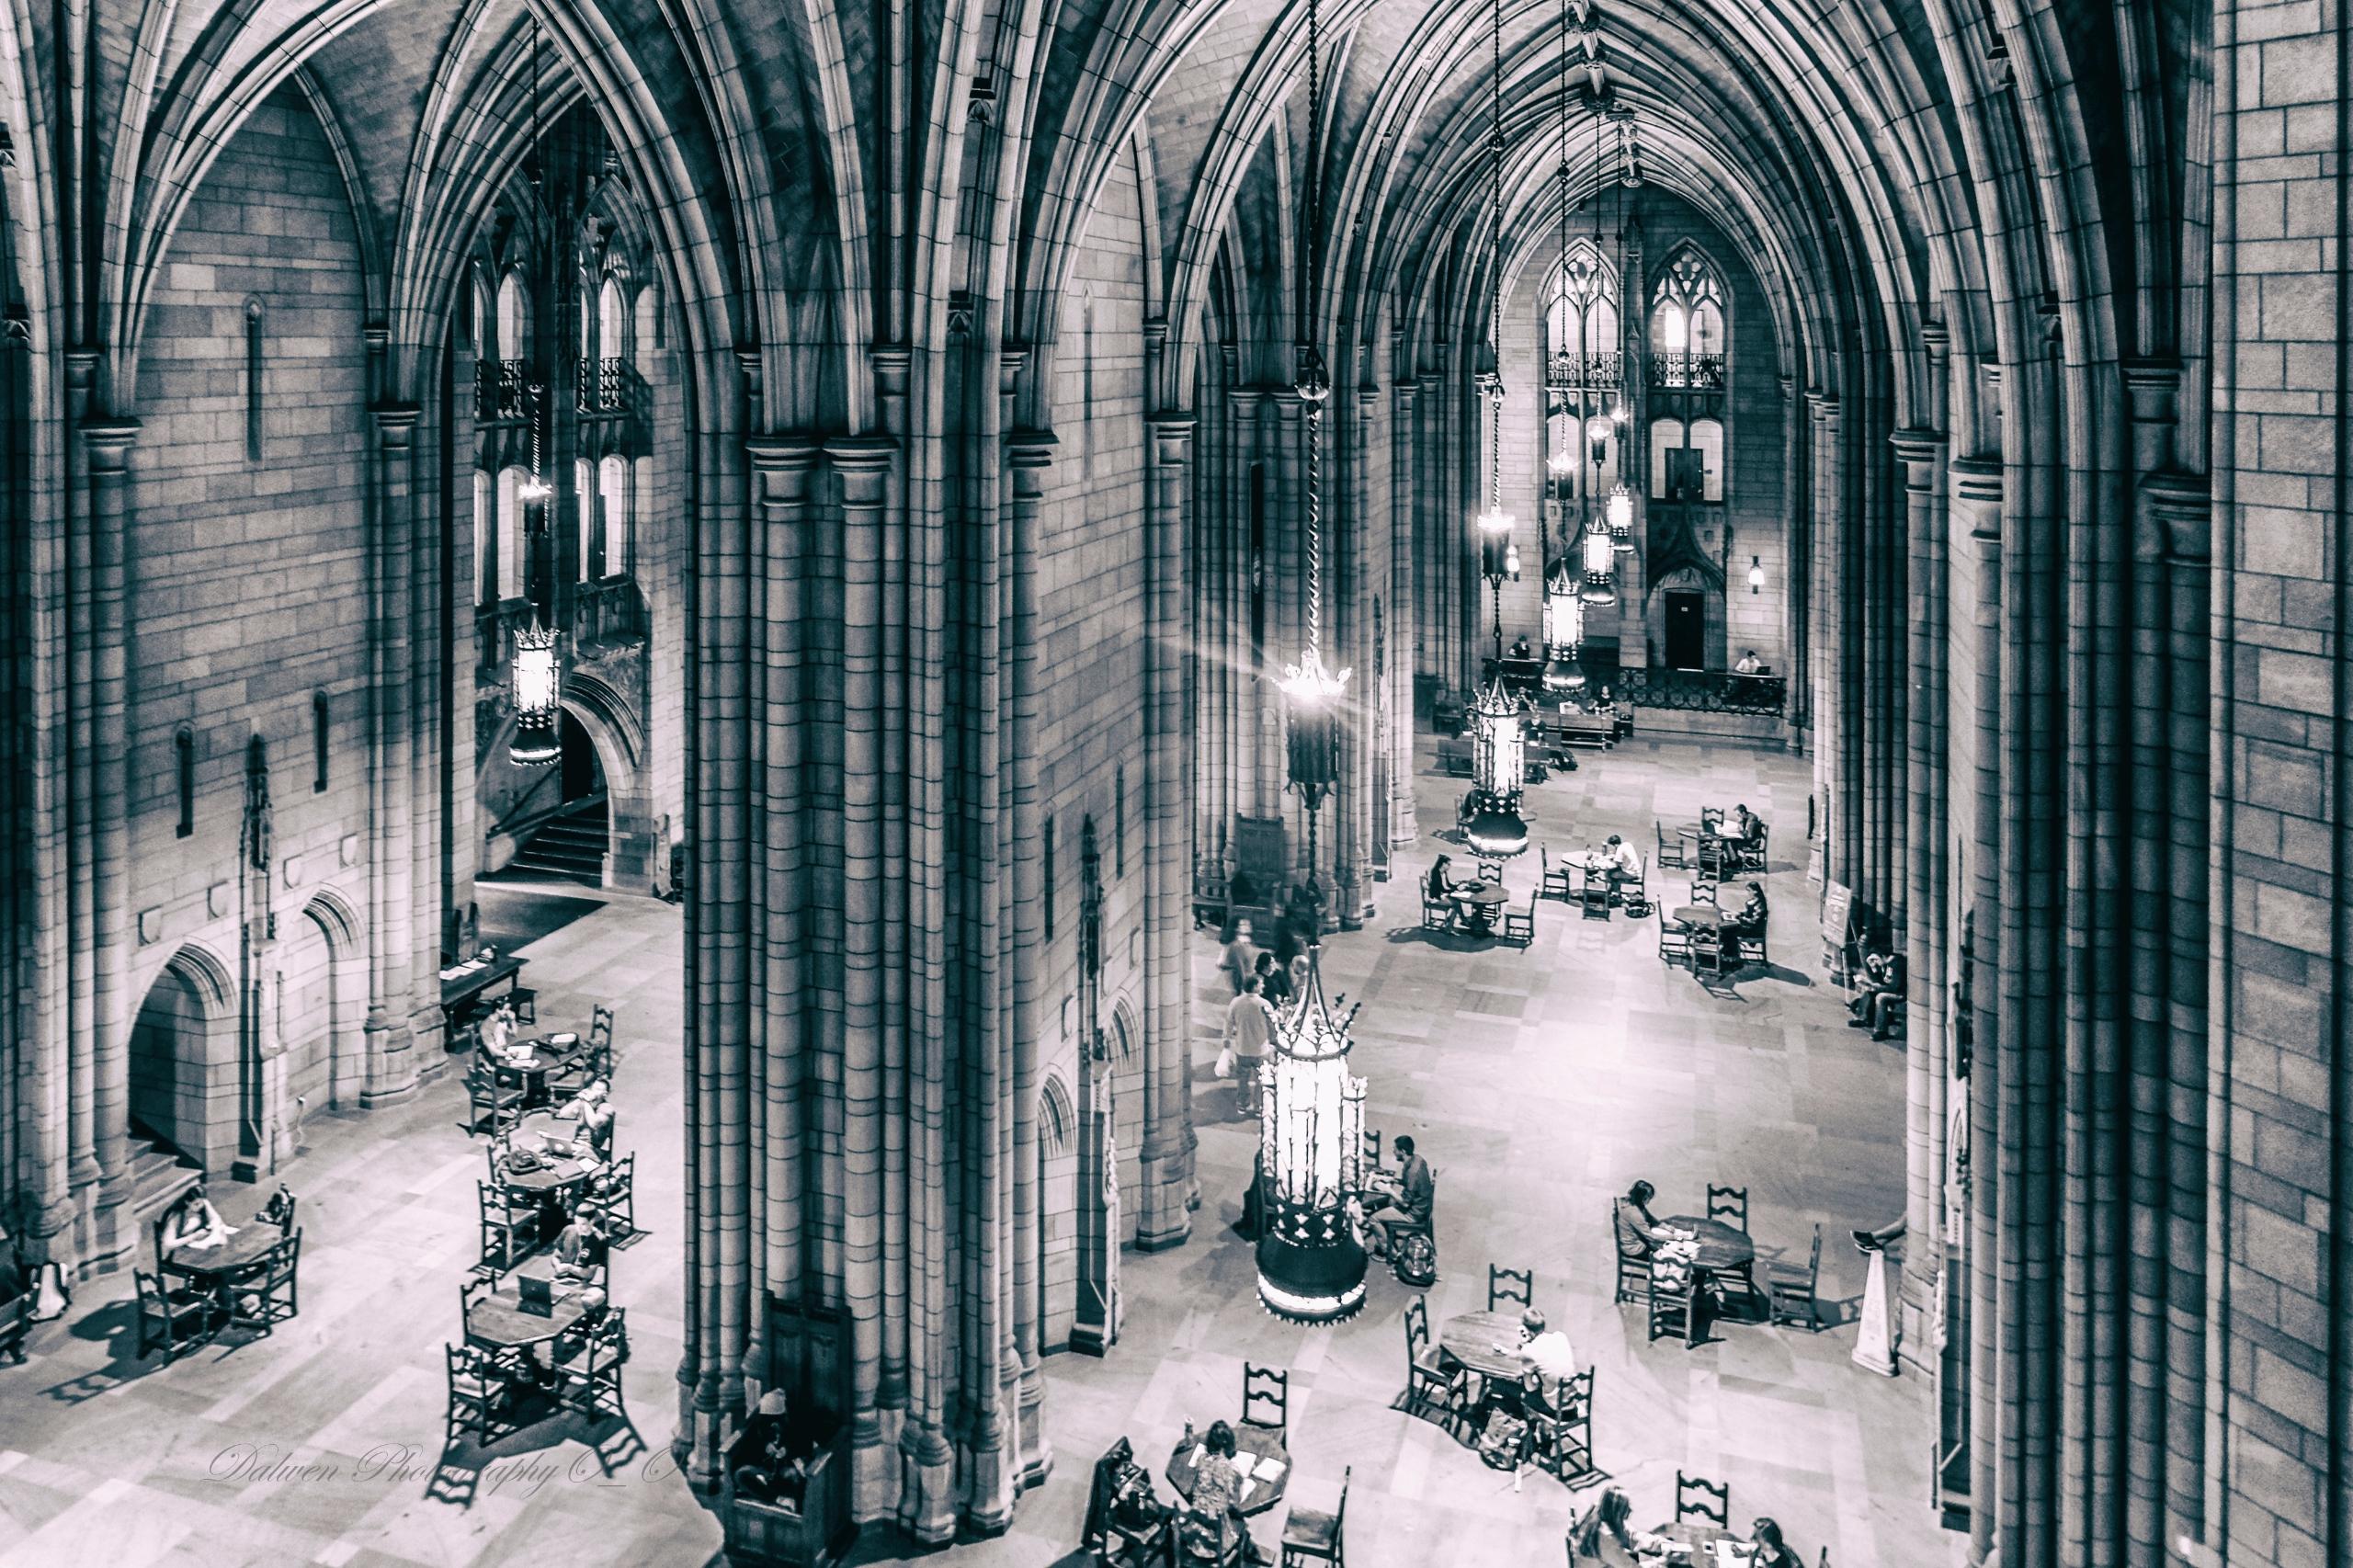 Delight - people, lights, indoor - dalwenphotography | ello